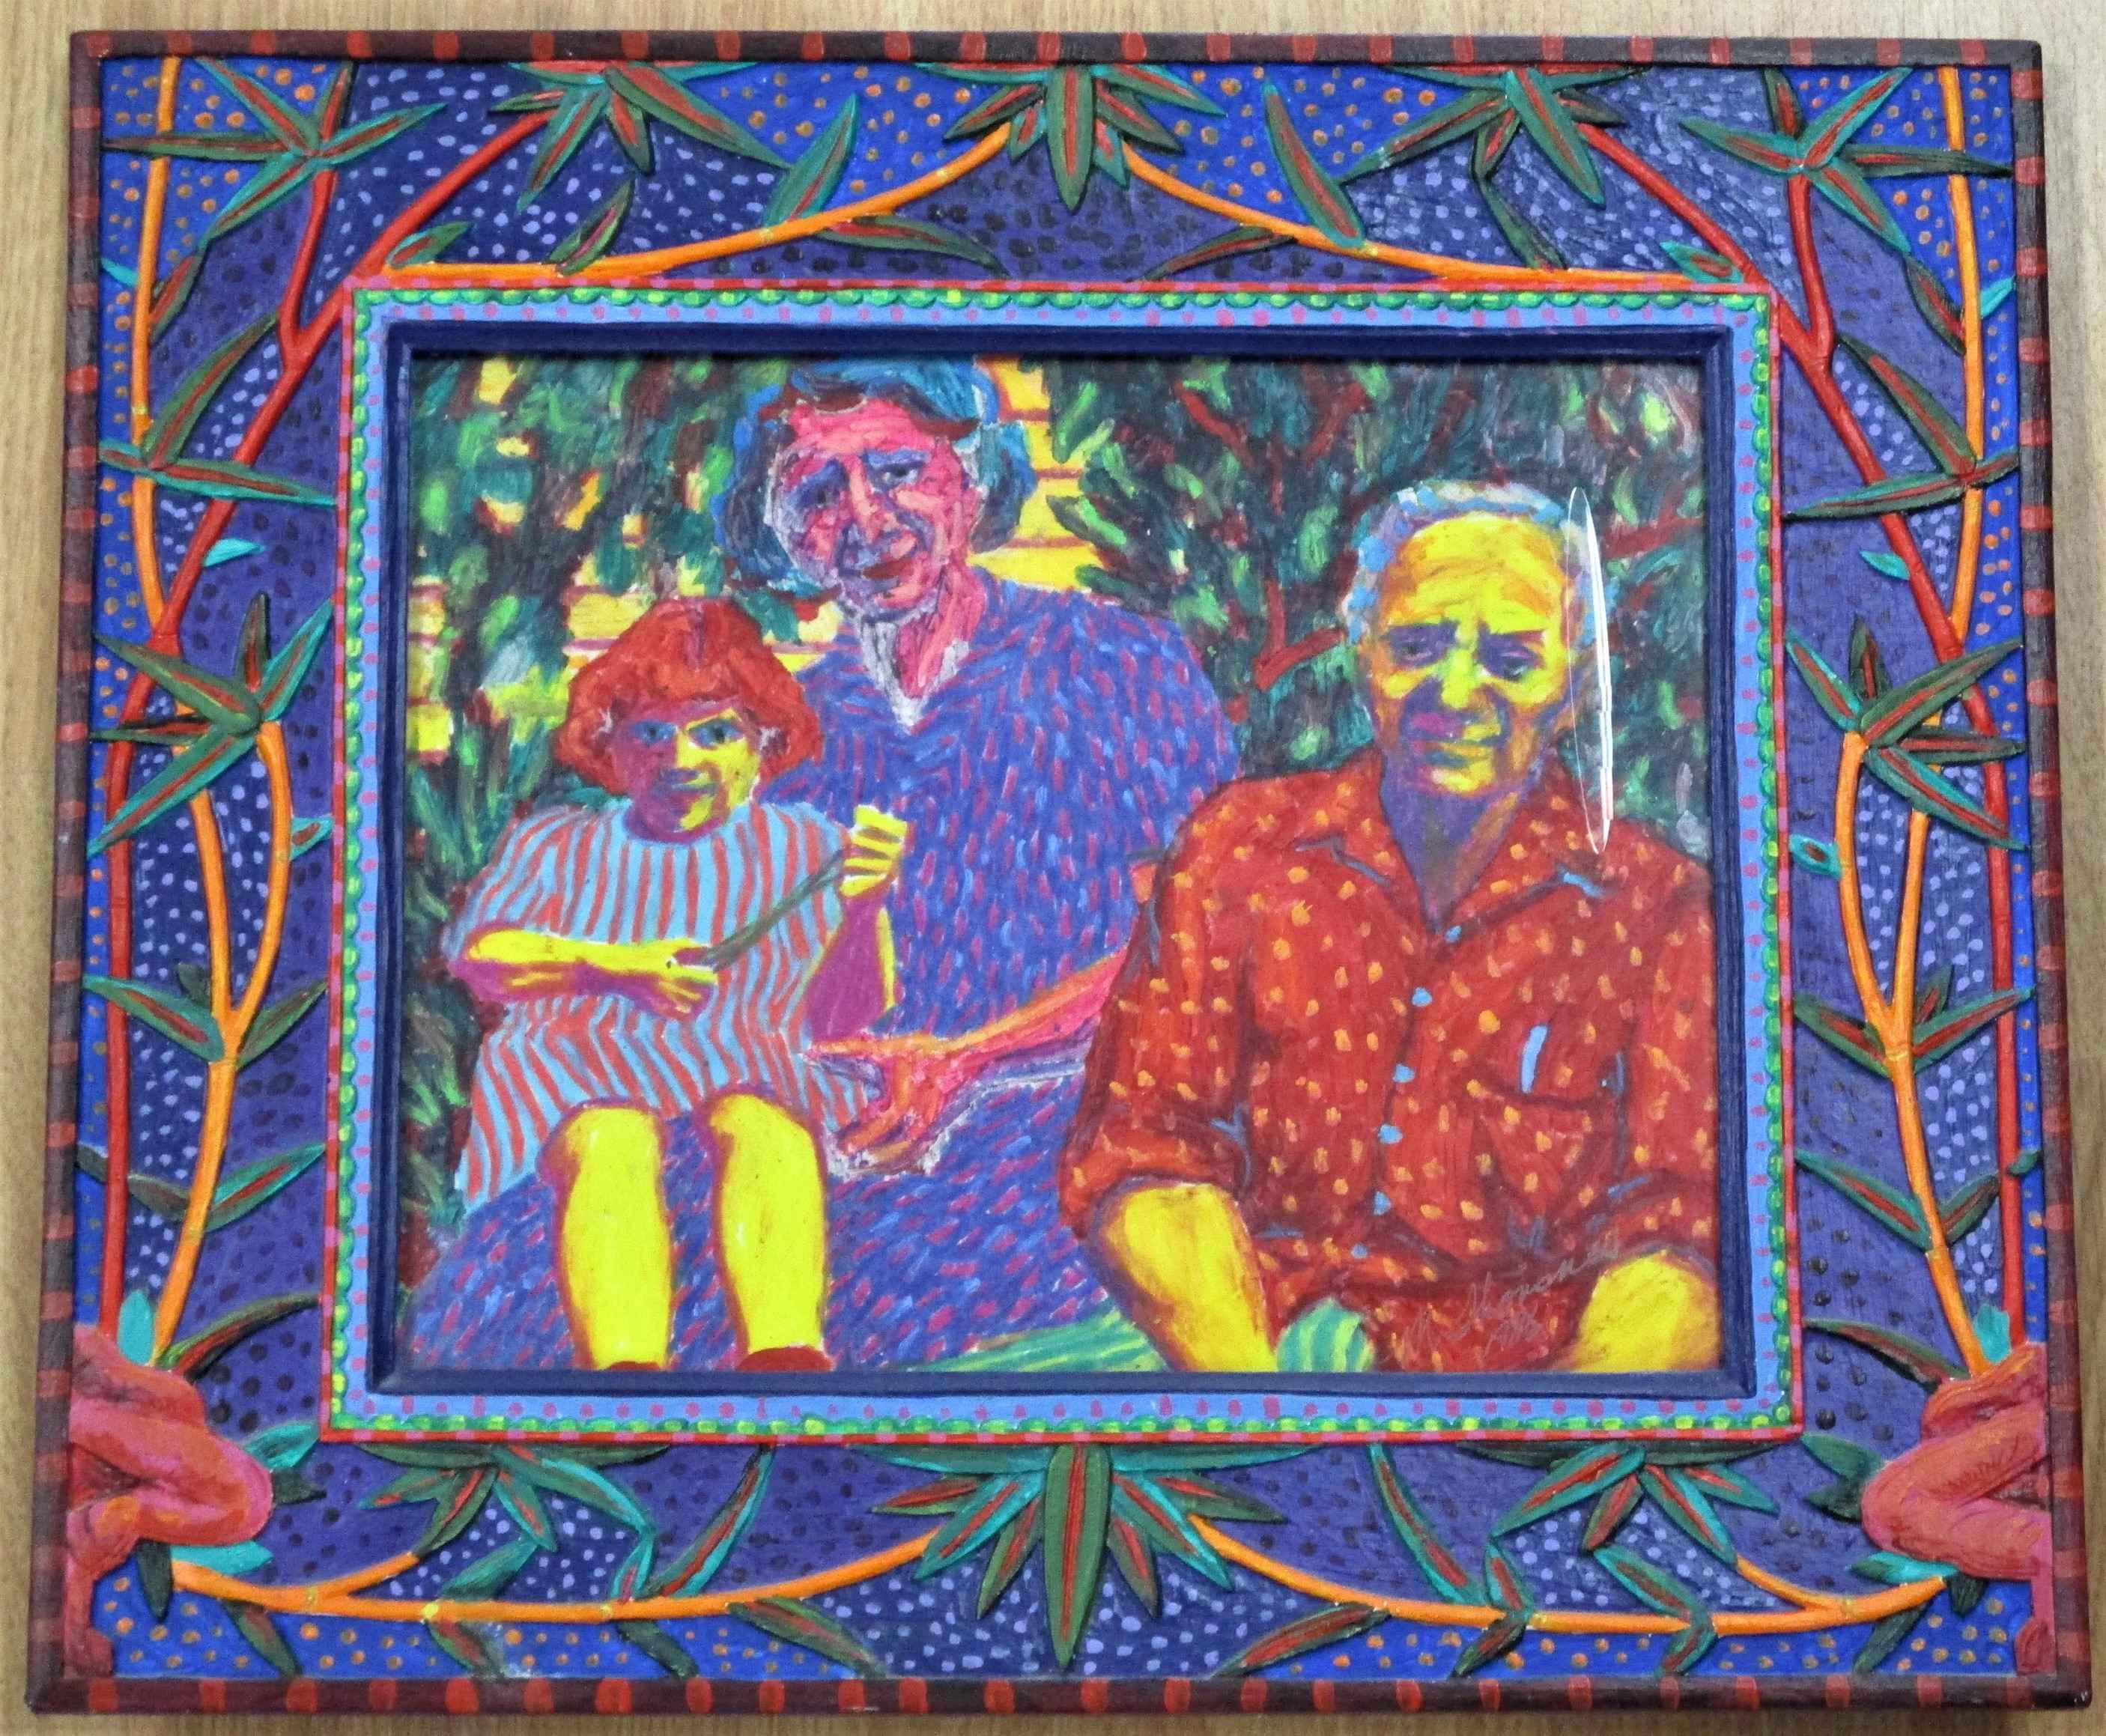 Unknown (3 people) by  Melinda Thorsnes - Masterpiece Online